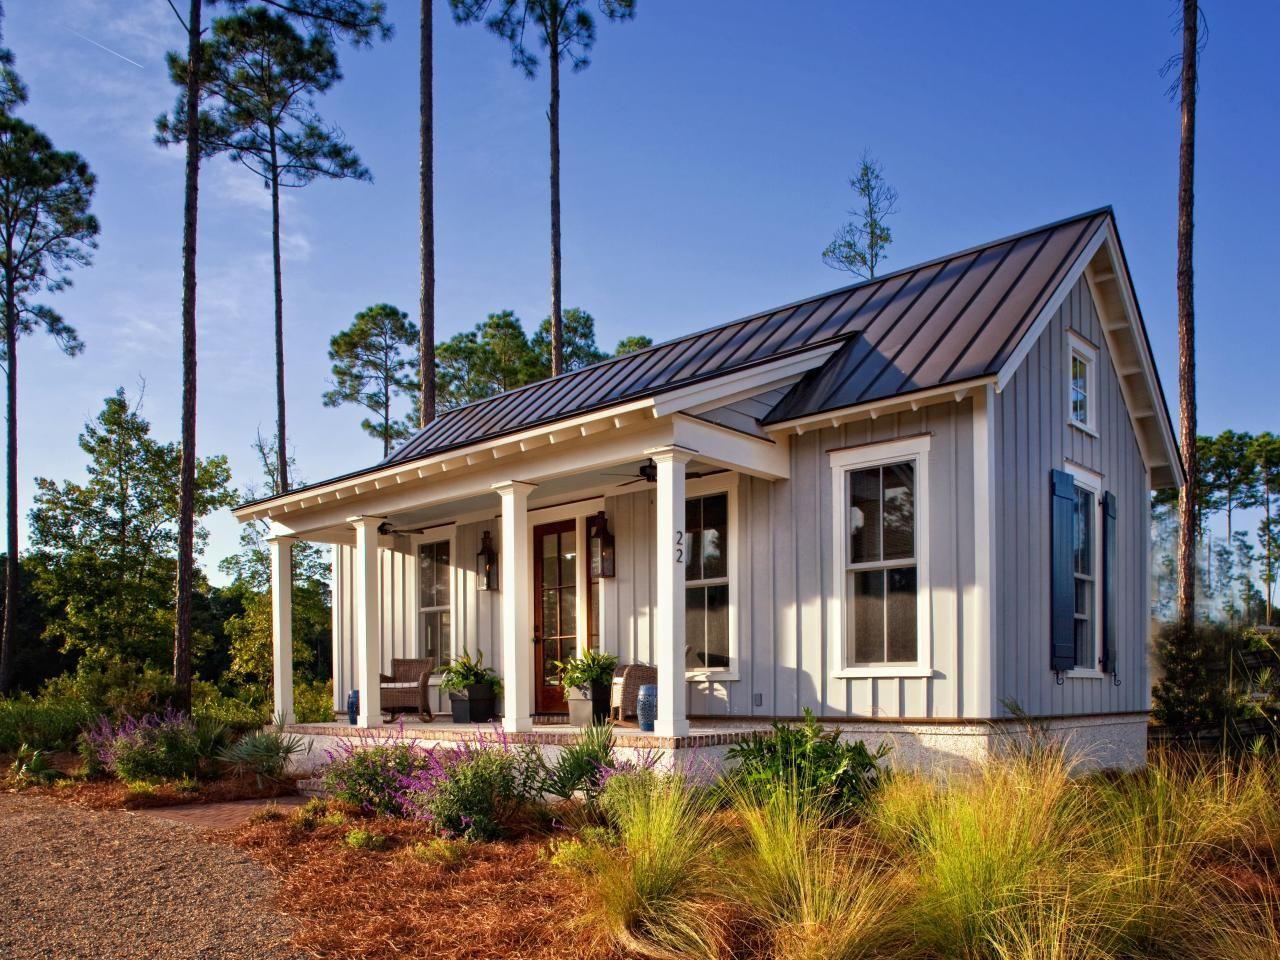 Cozy Farmhouse Cottage Maximizes Use Of Small Space Tiny